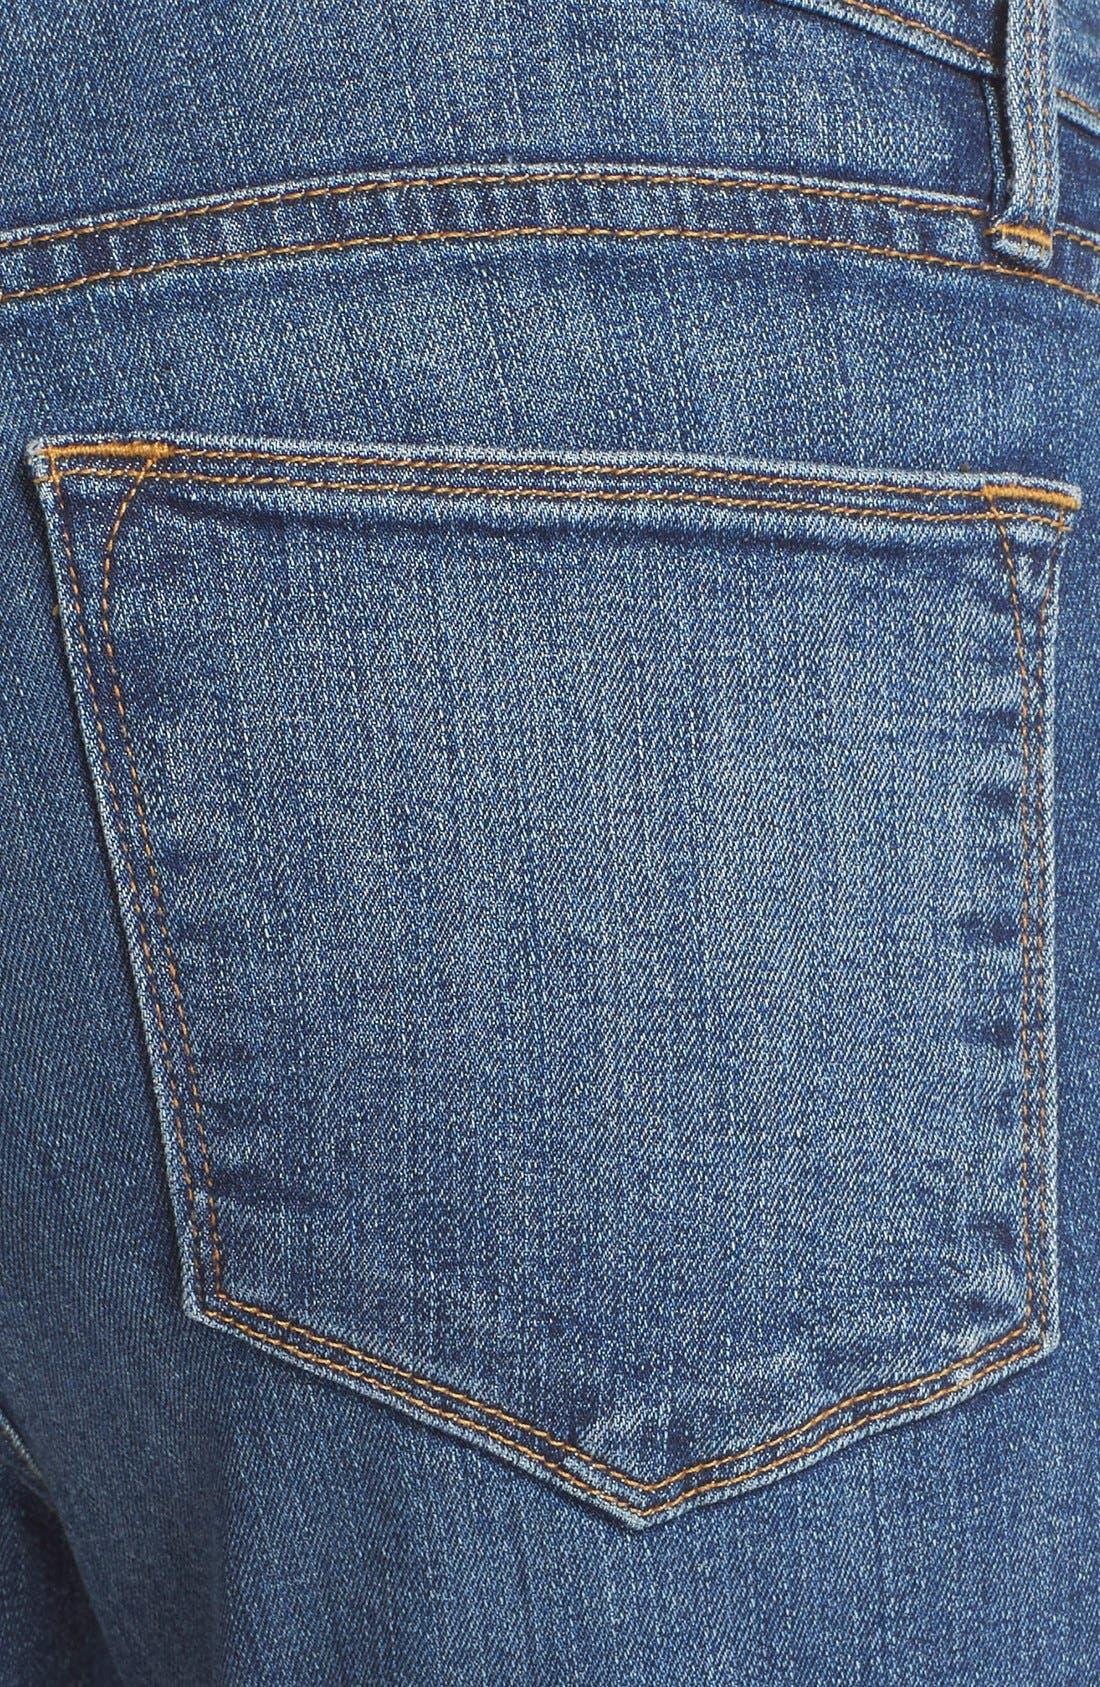 'Le High Flare' Jeans,                             Alternate thumbnail 8, color,